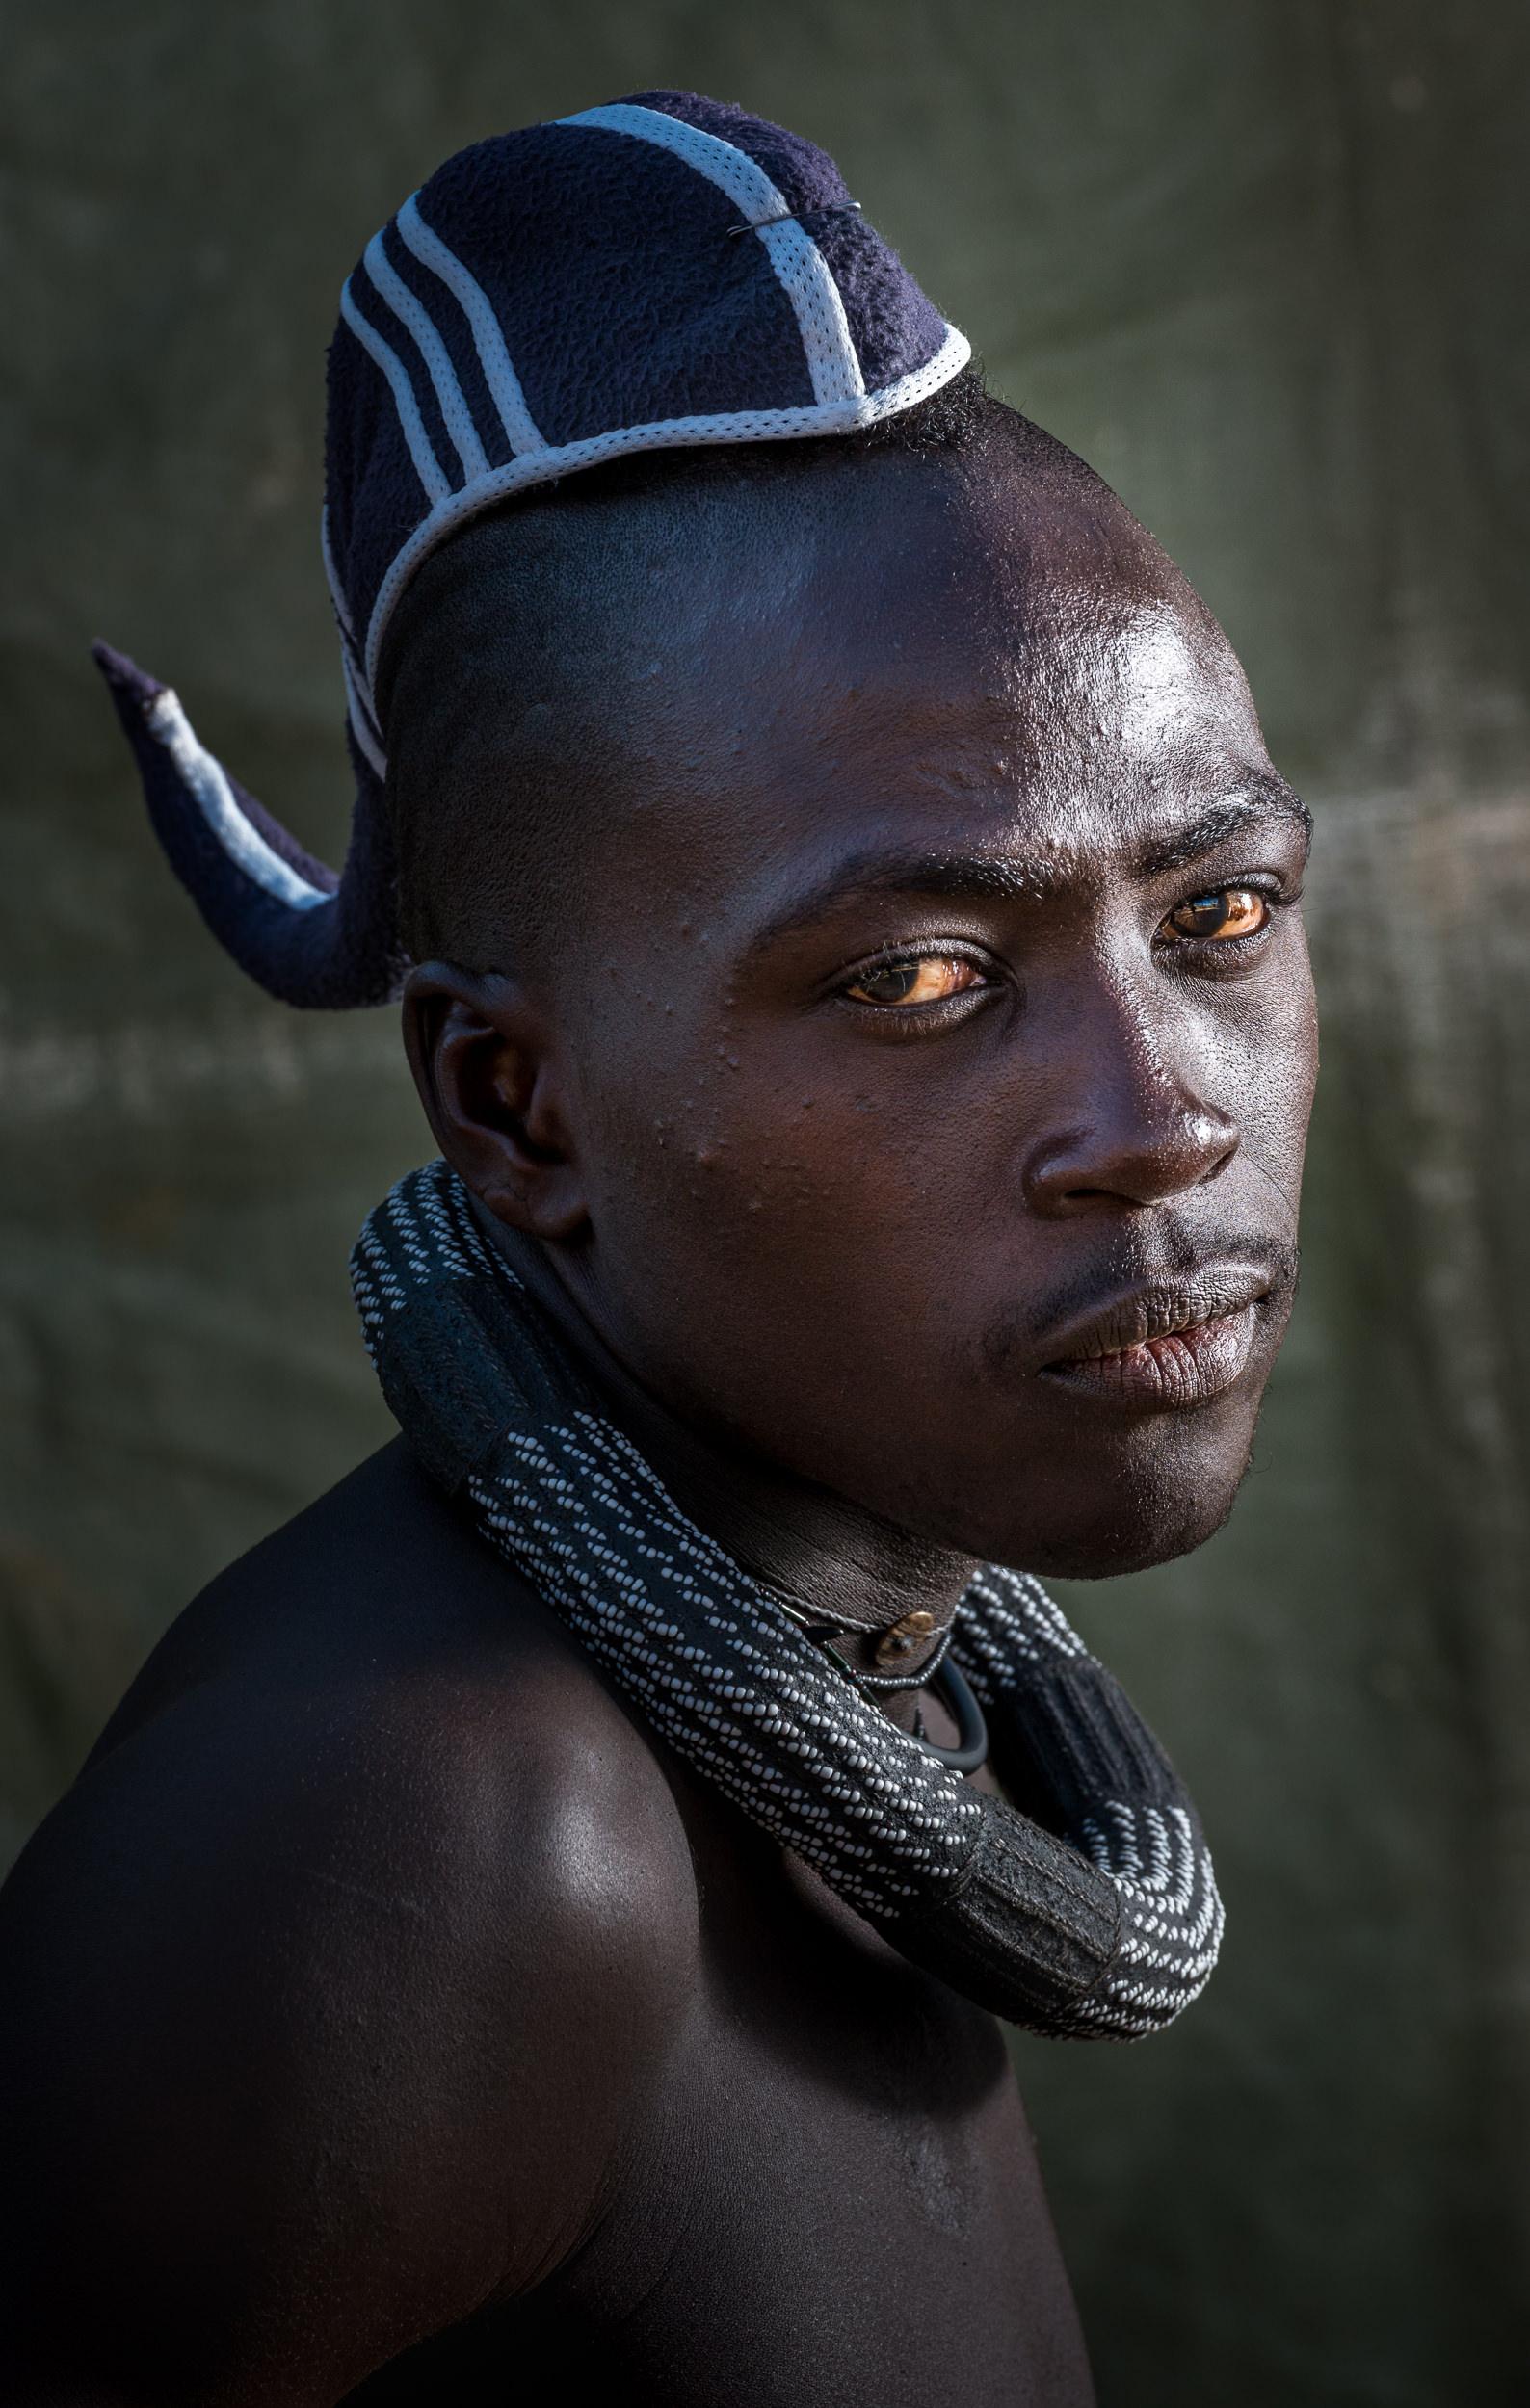 [2016 06 19] Namibia Epupa (NIKON D800) 9174-Edit-Edit.jpg